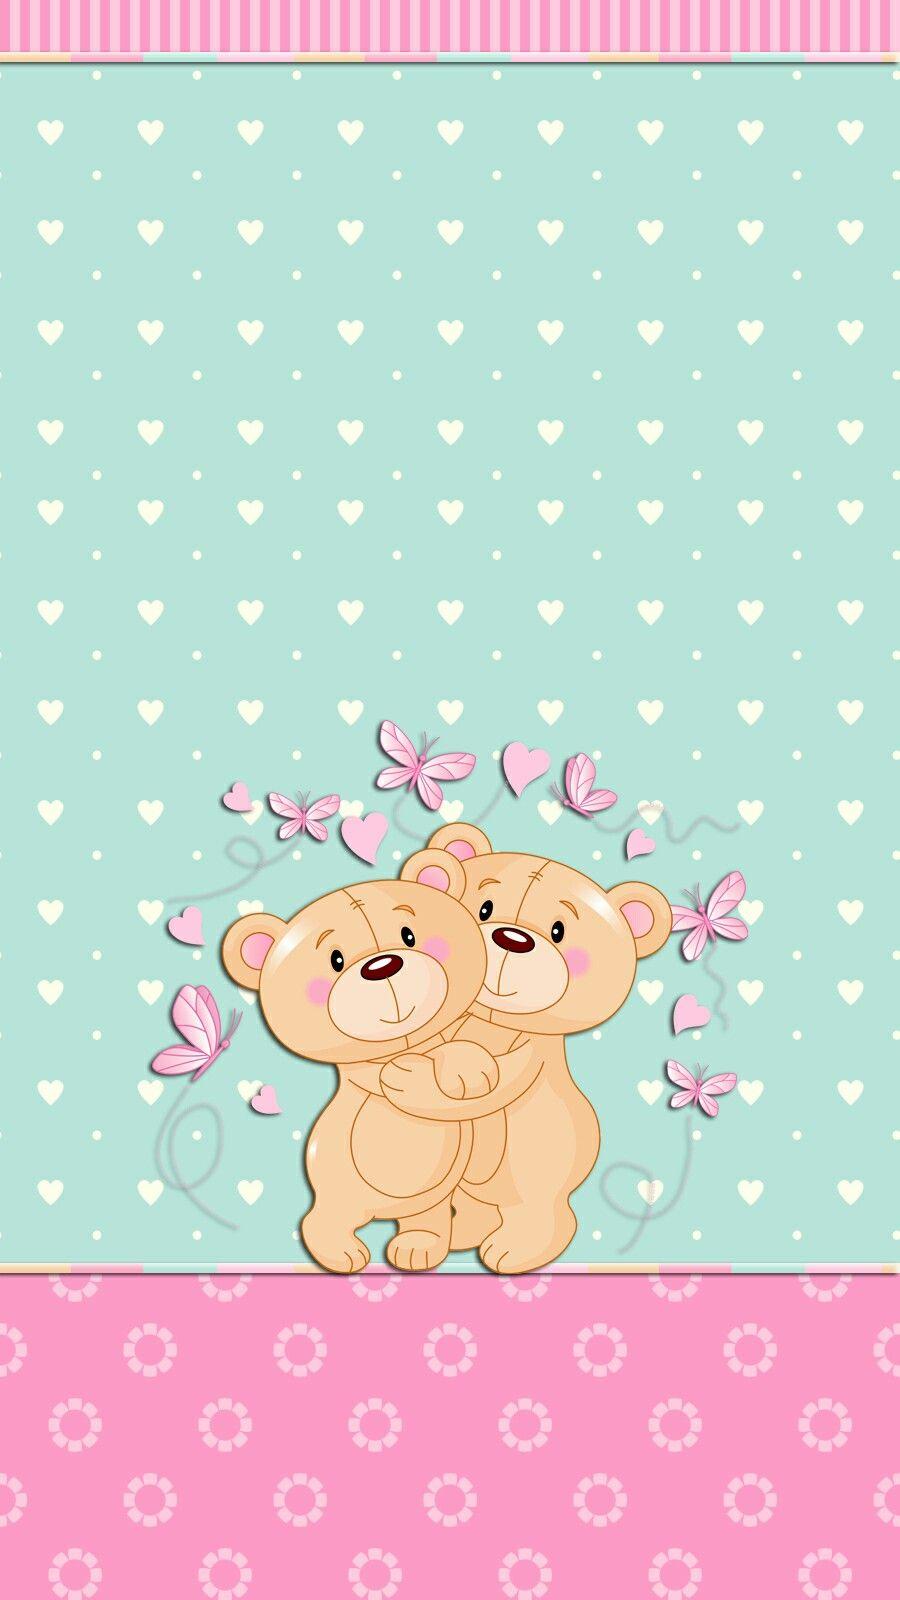 Best Wallpaper Hello Kitty Mint Green - 1093d09cd1f4809e2ea862be9cfbd438  2018_8626100.jpg